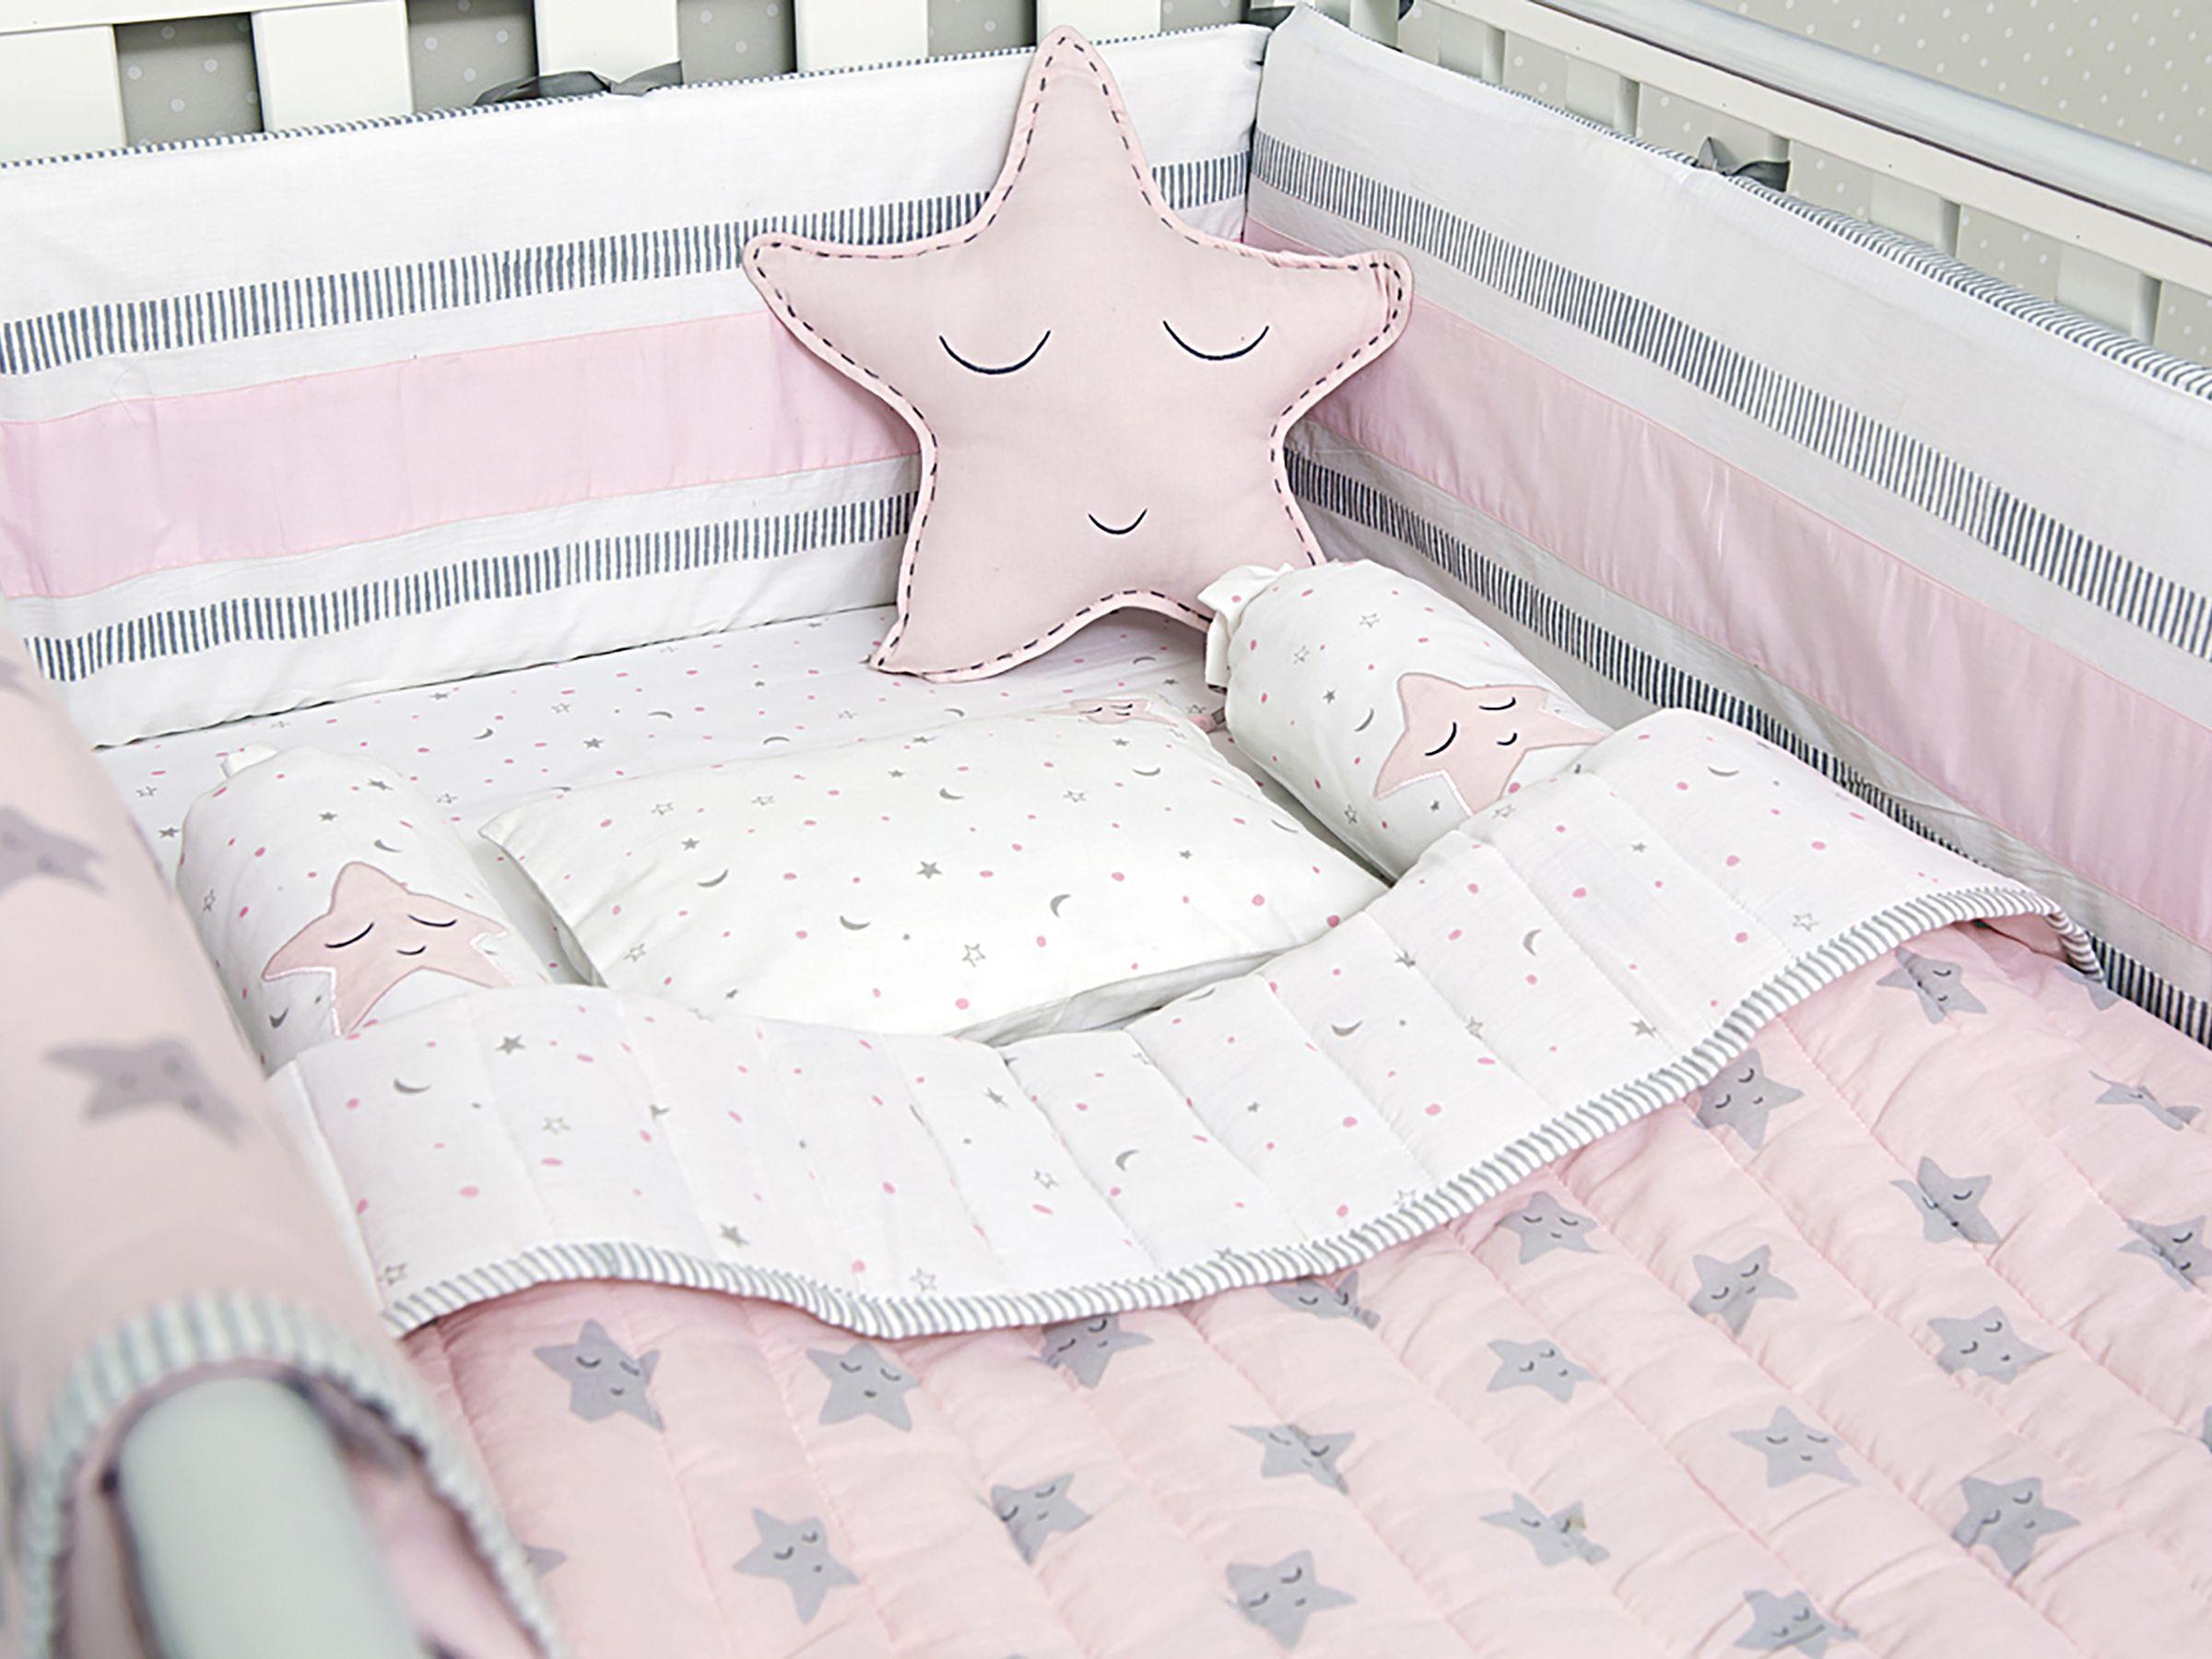 sleepy starorganic crib bedding set baby bedding set baby  - sleepy starorganic crib bedding set baby bedding set baby blanket baby